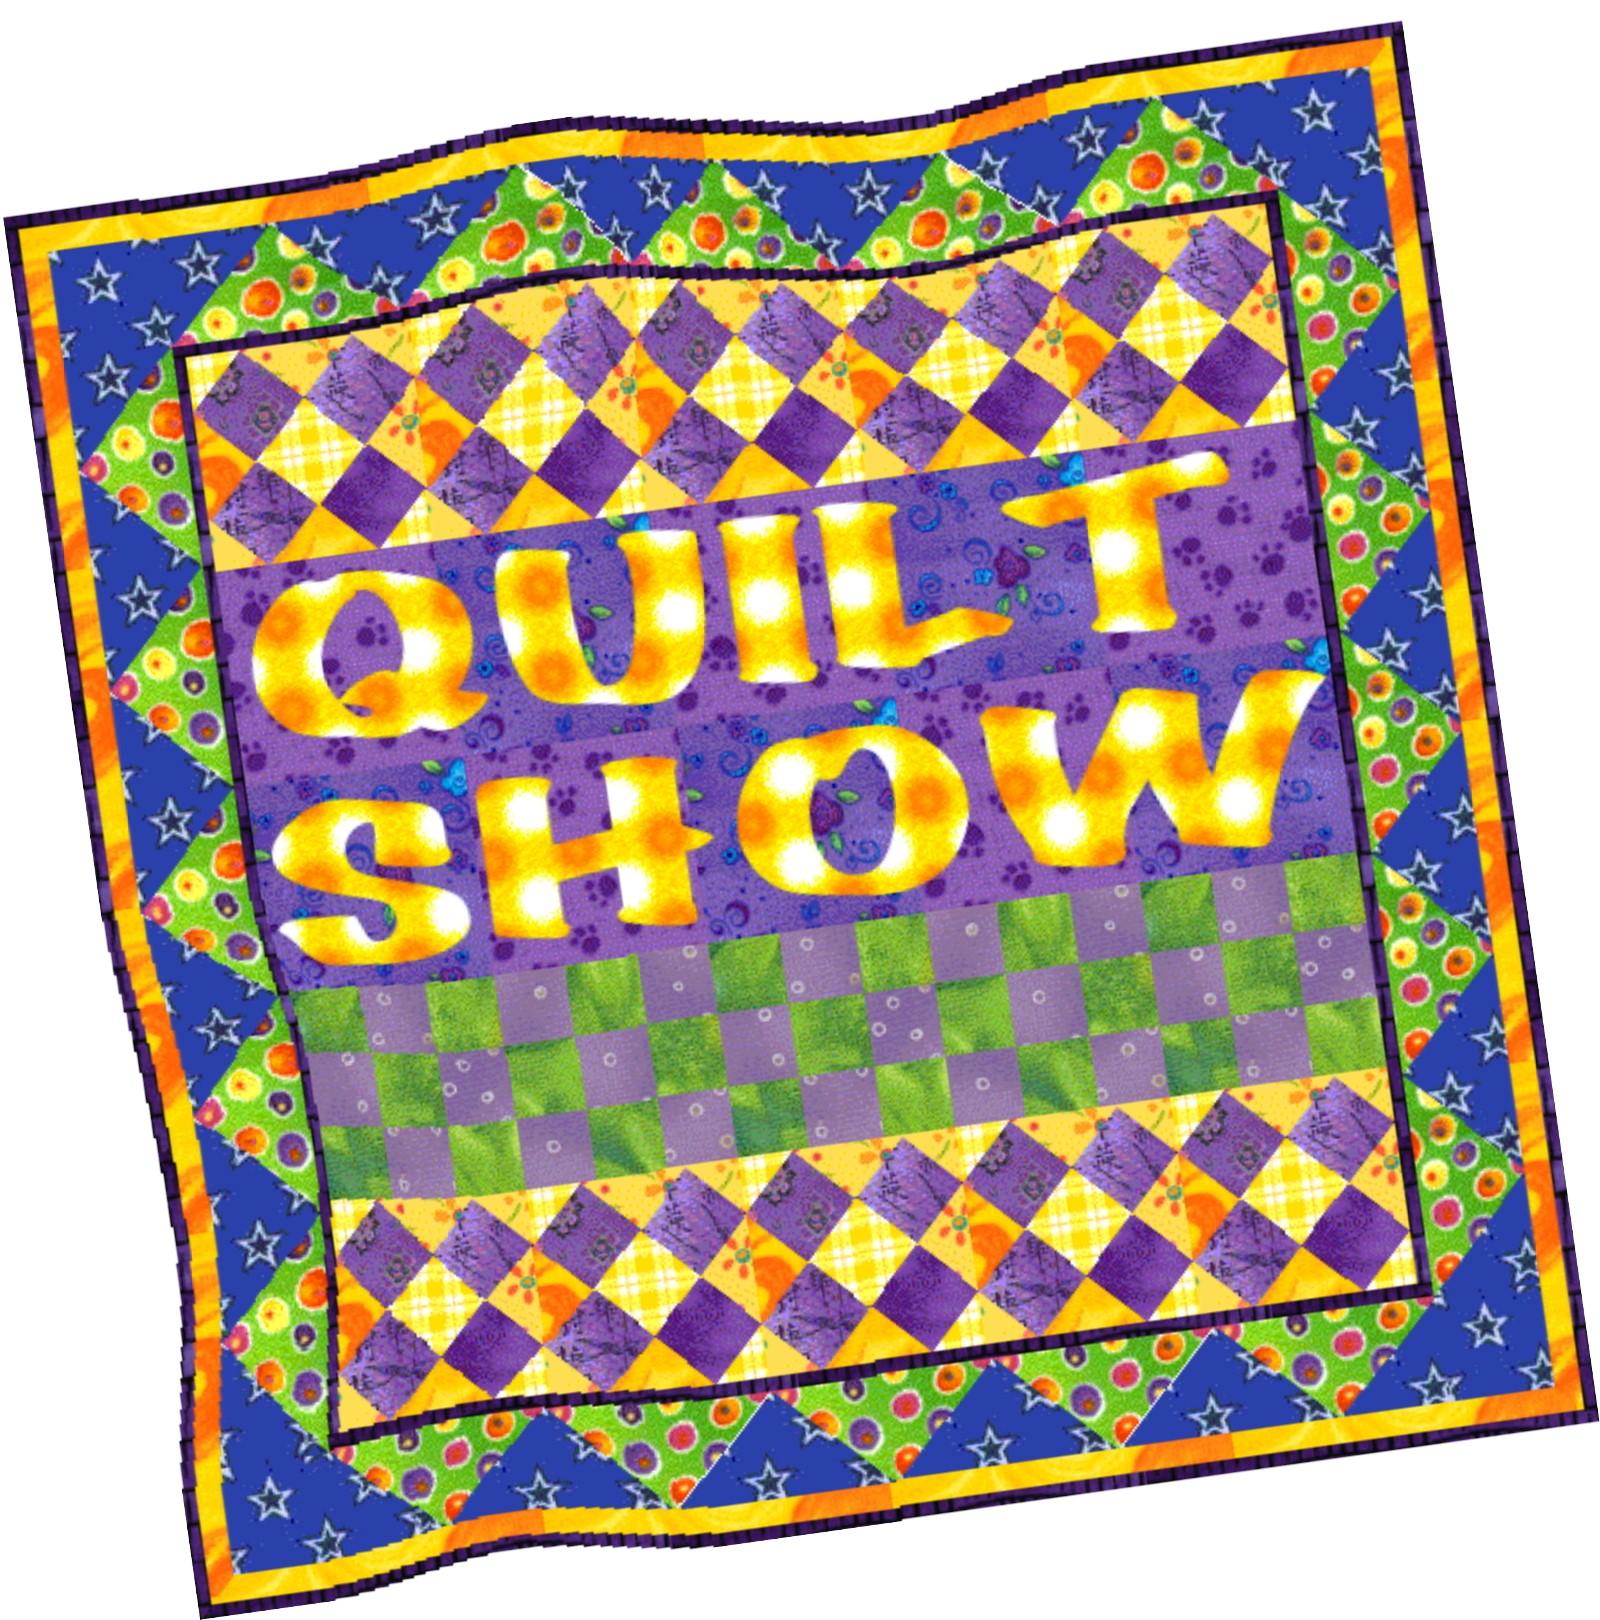 Quilt And Clipart Gallery .-Quilt and Clipart gallery .-8